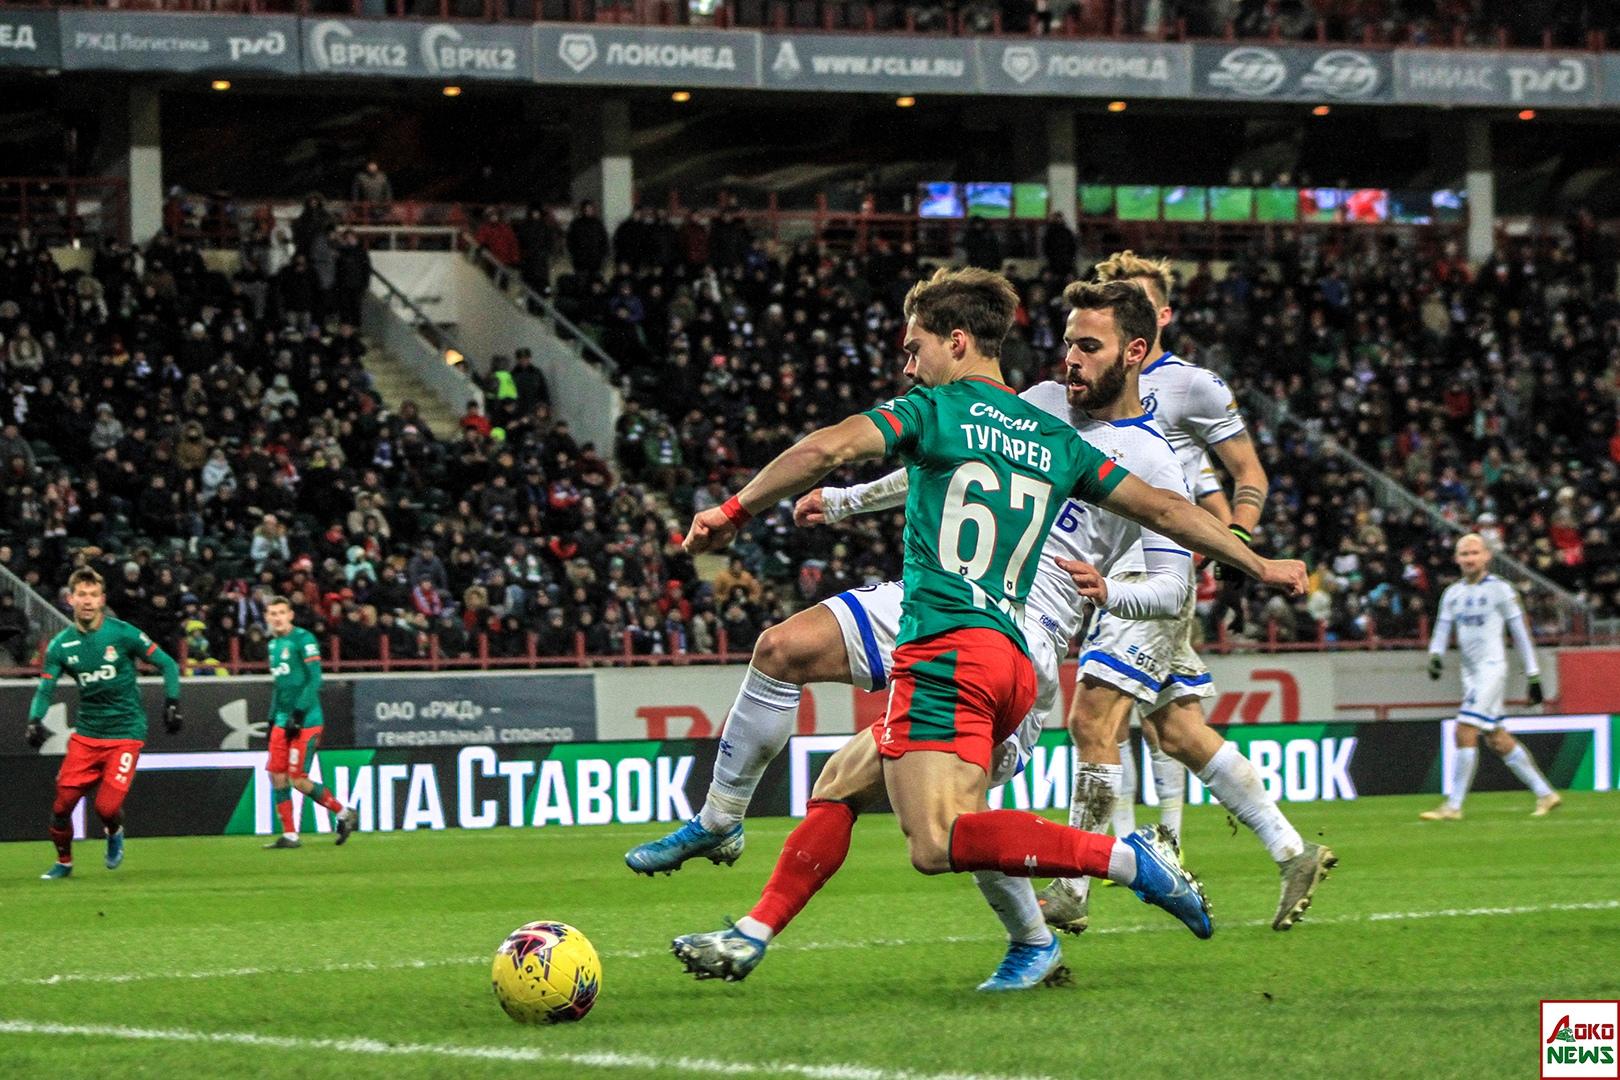 Локомотив - Динамо. Фото: Дмитрий Бурдонов / Loko.News